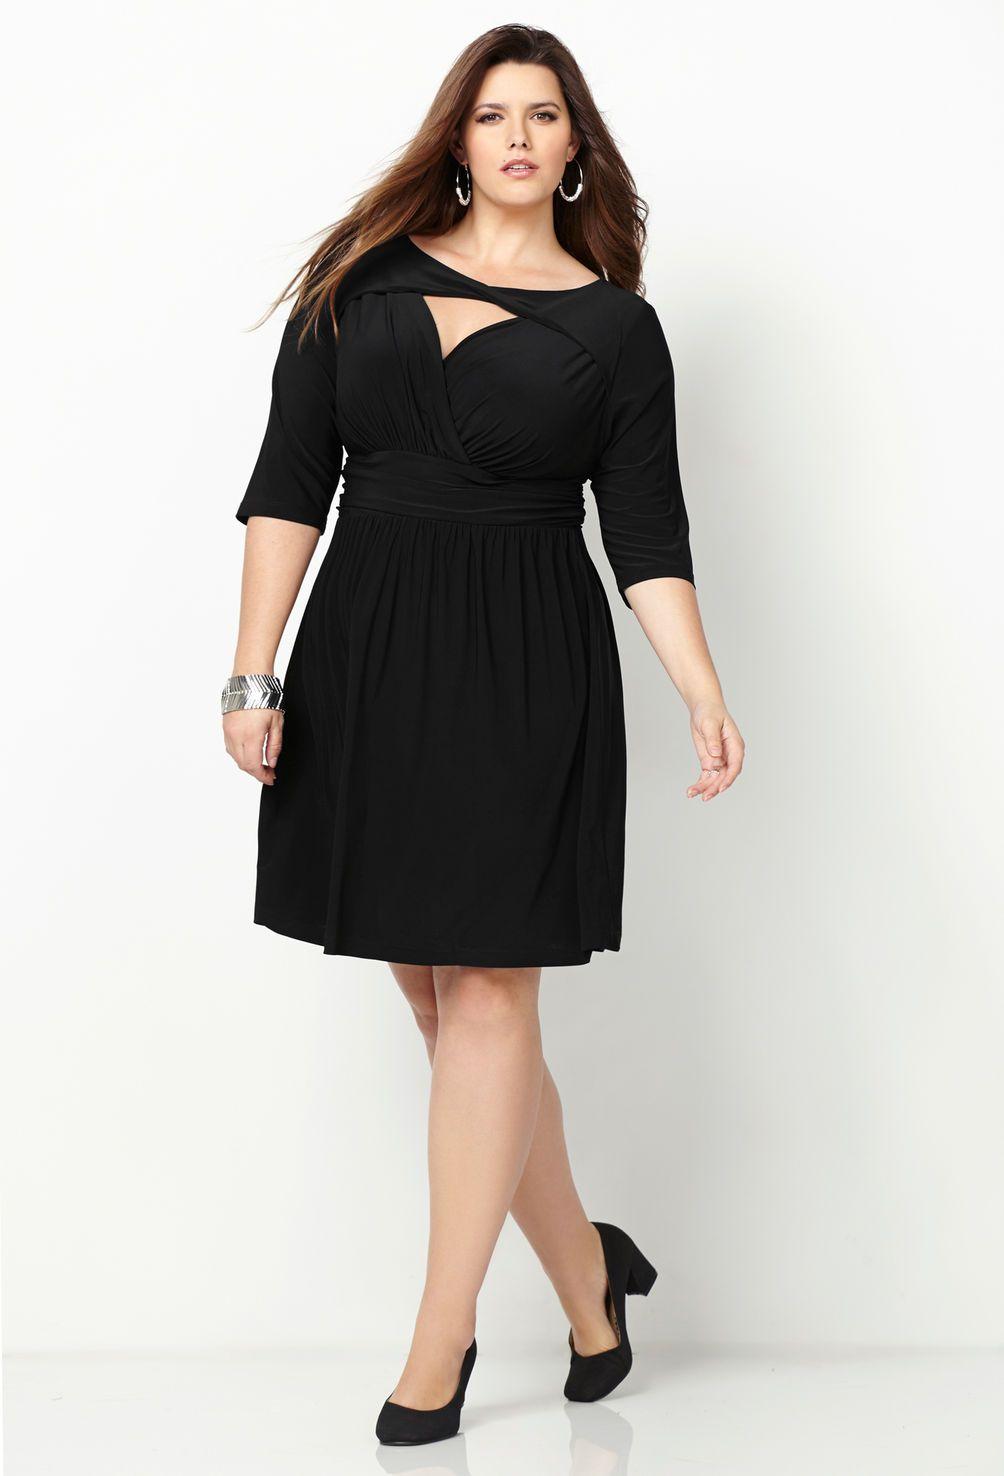 Criss Cross Cutout Dress-Plus Size Dress-Avenue #Dress